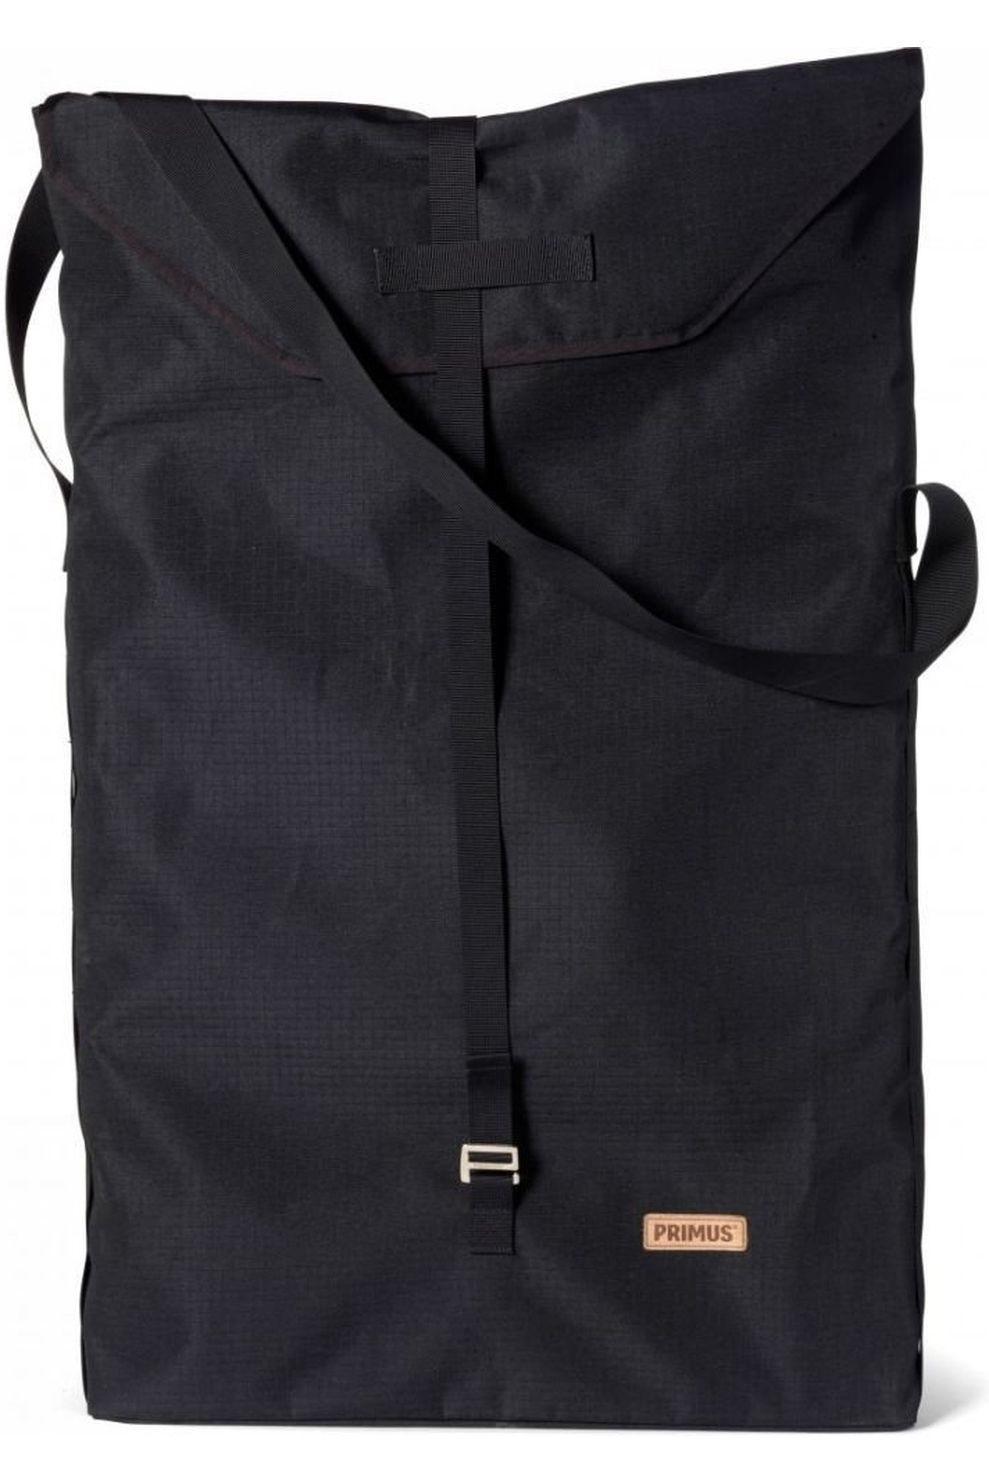 Primus Accessoire Openfire Pan Pack Sack - Zwart